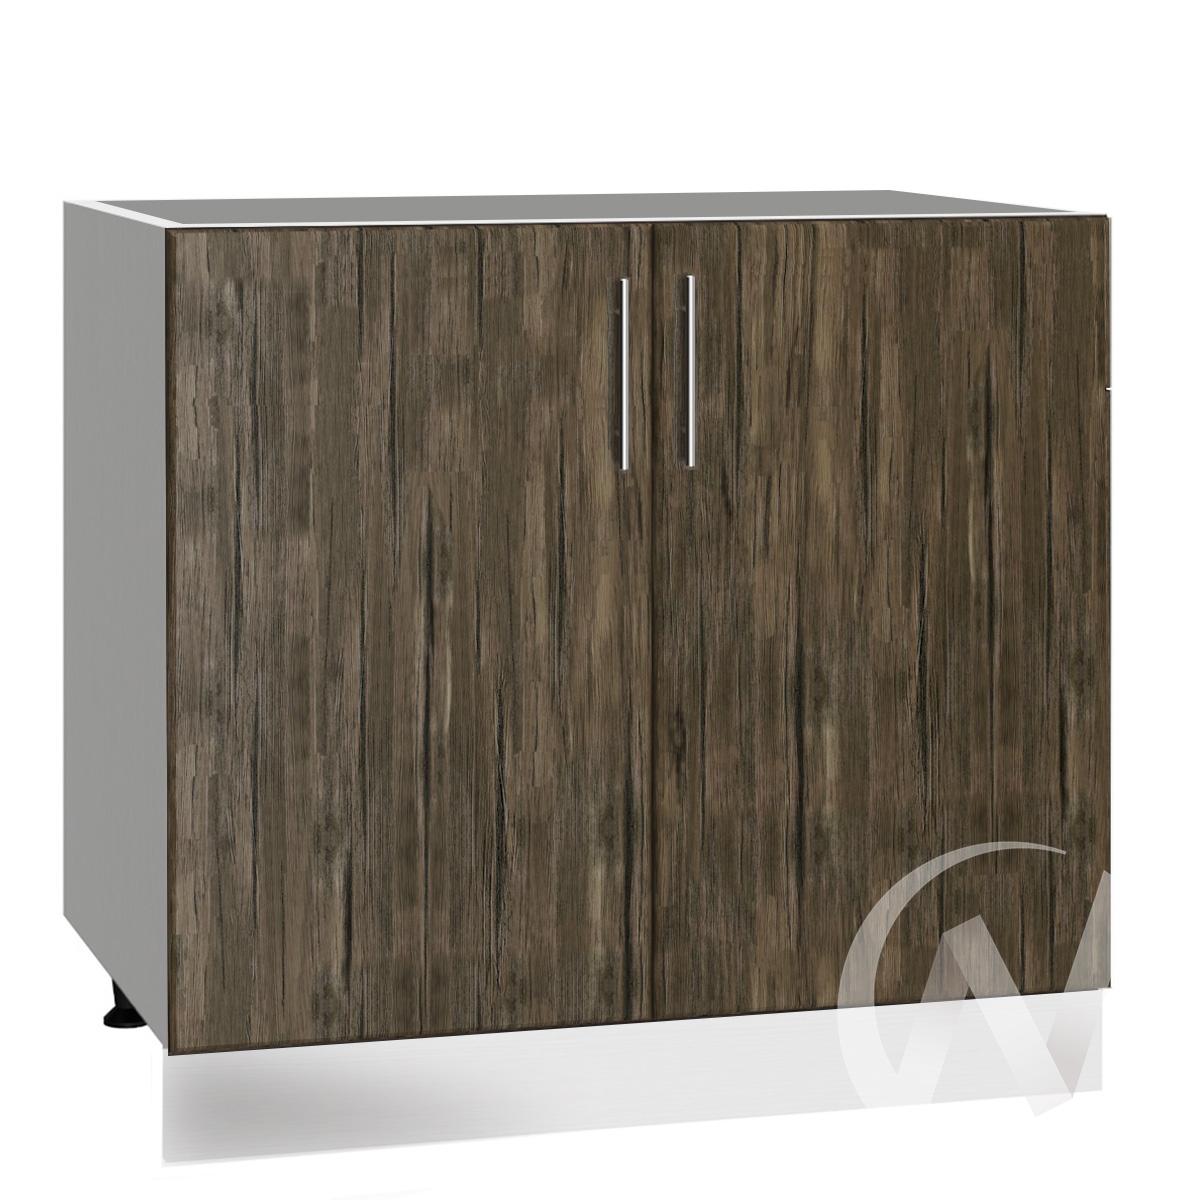 "Кухня ""Норден"": Шкаф нижний под мойку 800, ШНМ 800 (старое дерево/корпус белый)"